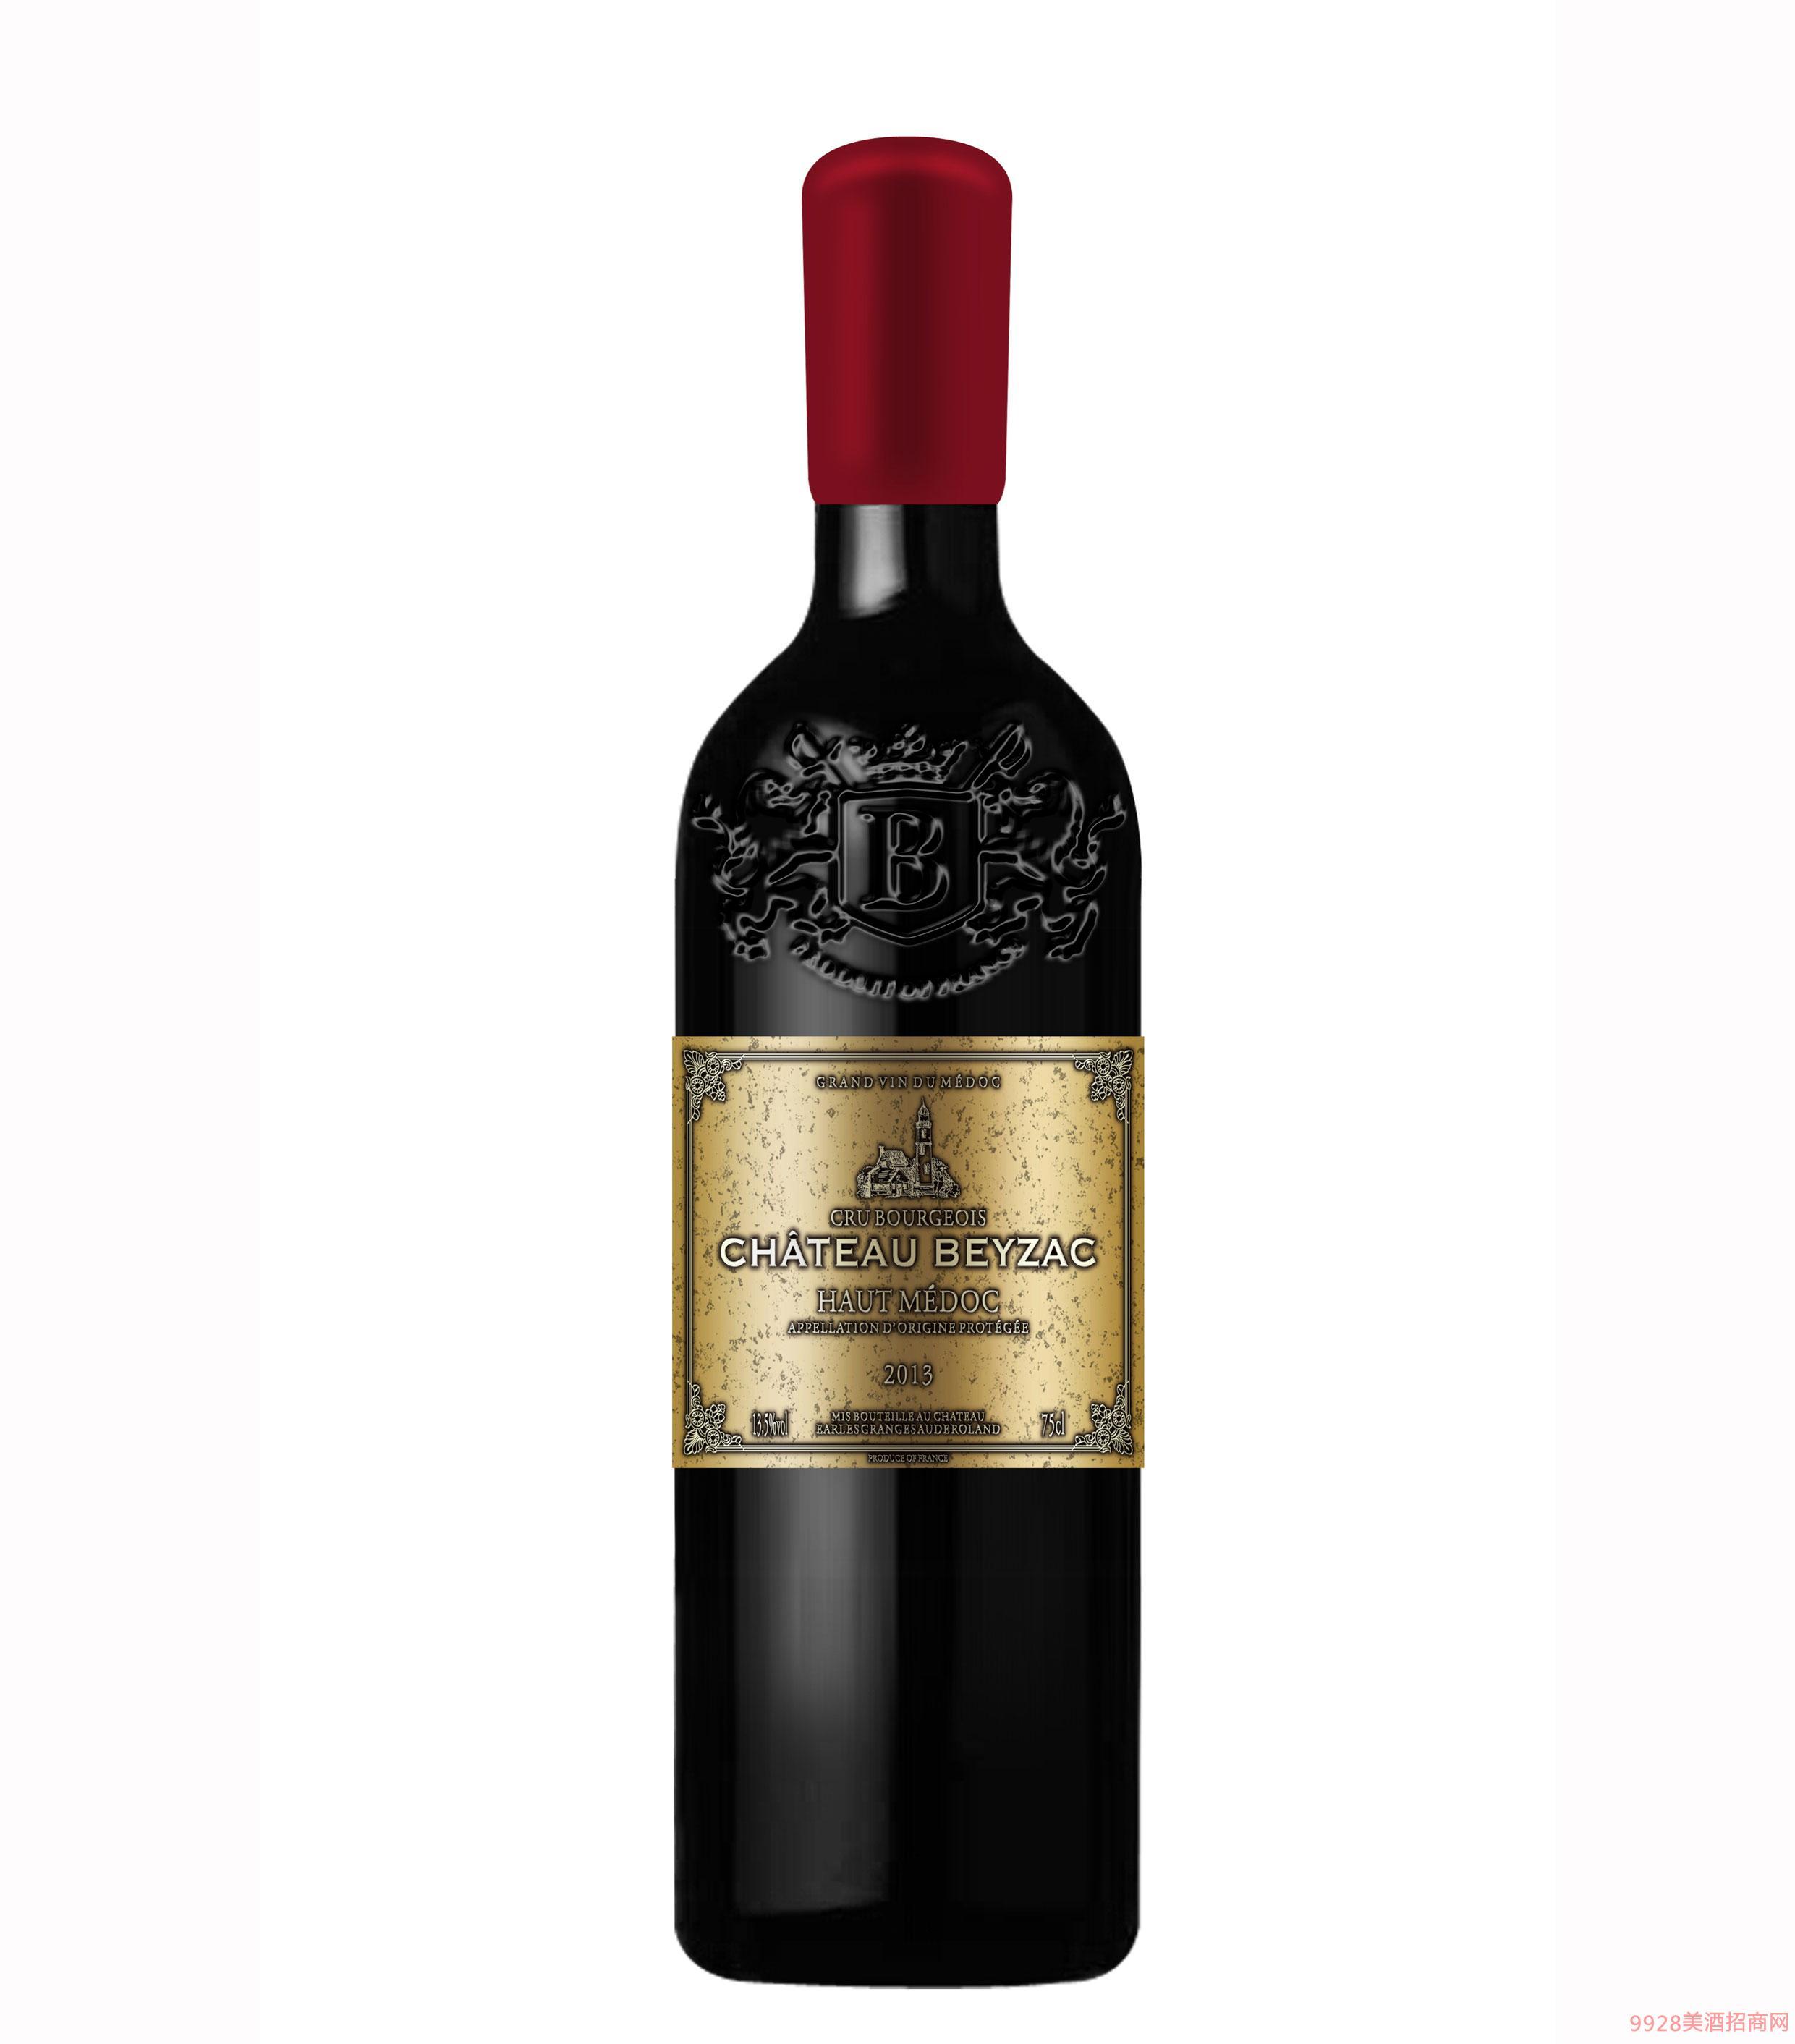 JK032柏雅干红葡萄酒